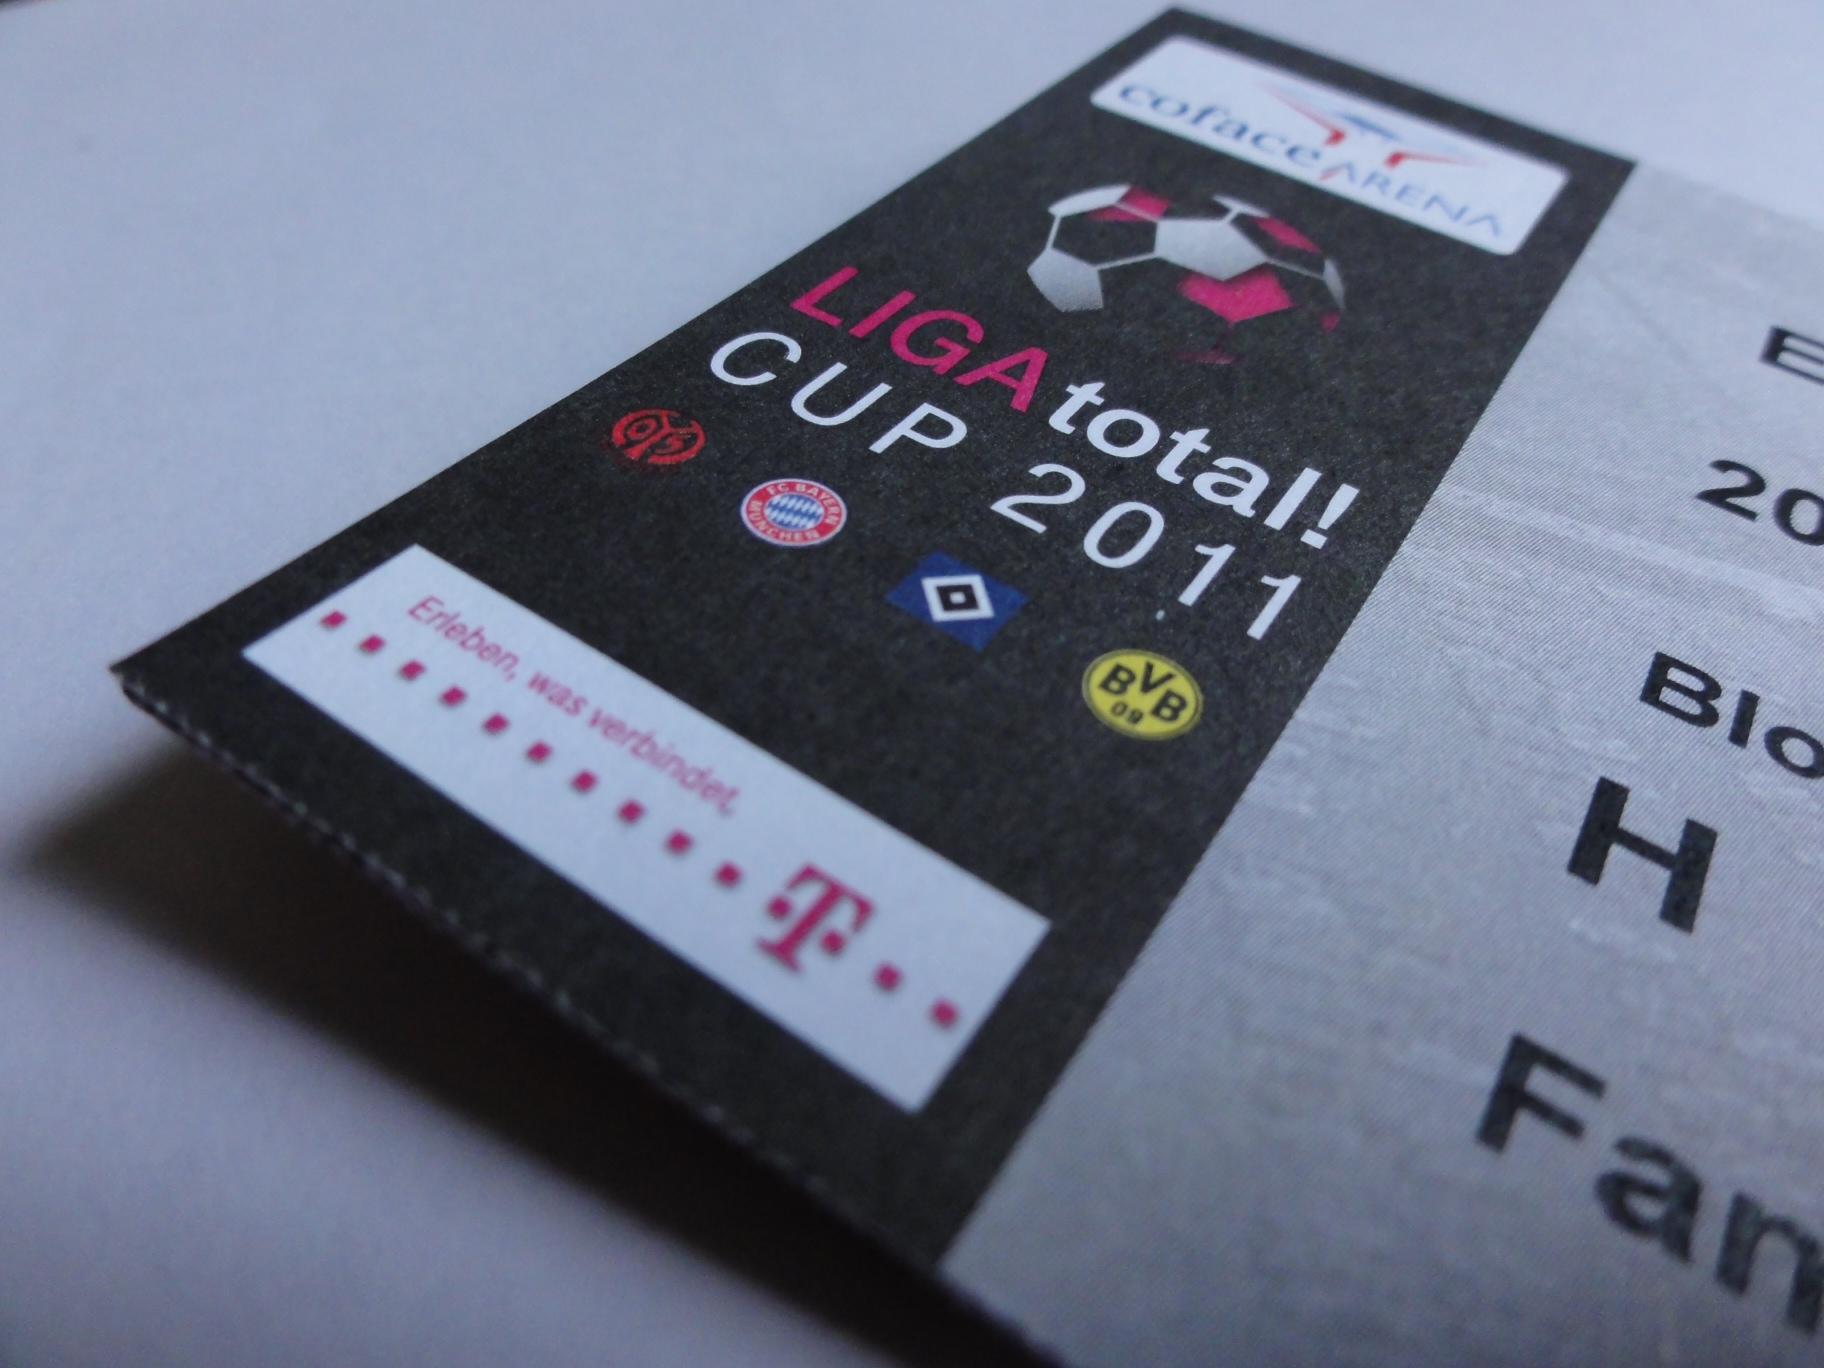 LIGA total! Cup 2011 – Coface Arena Mainz